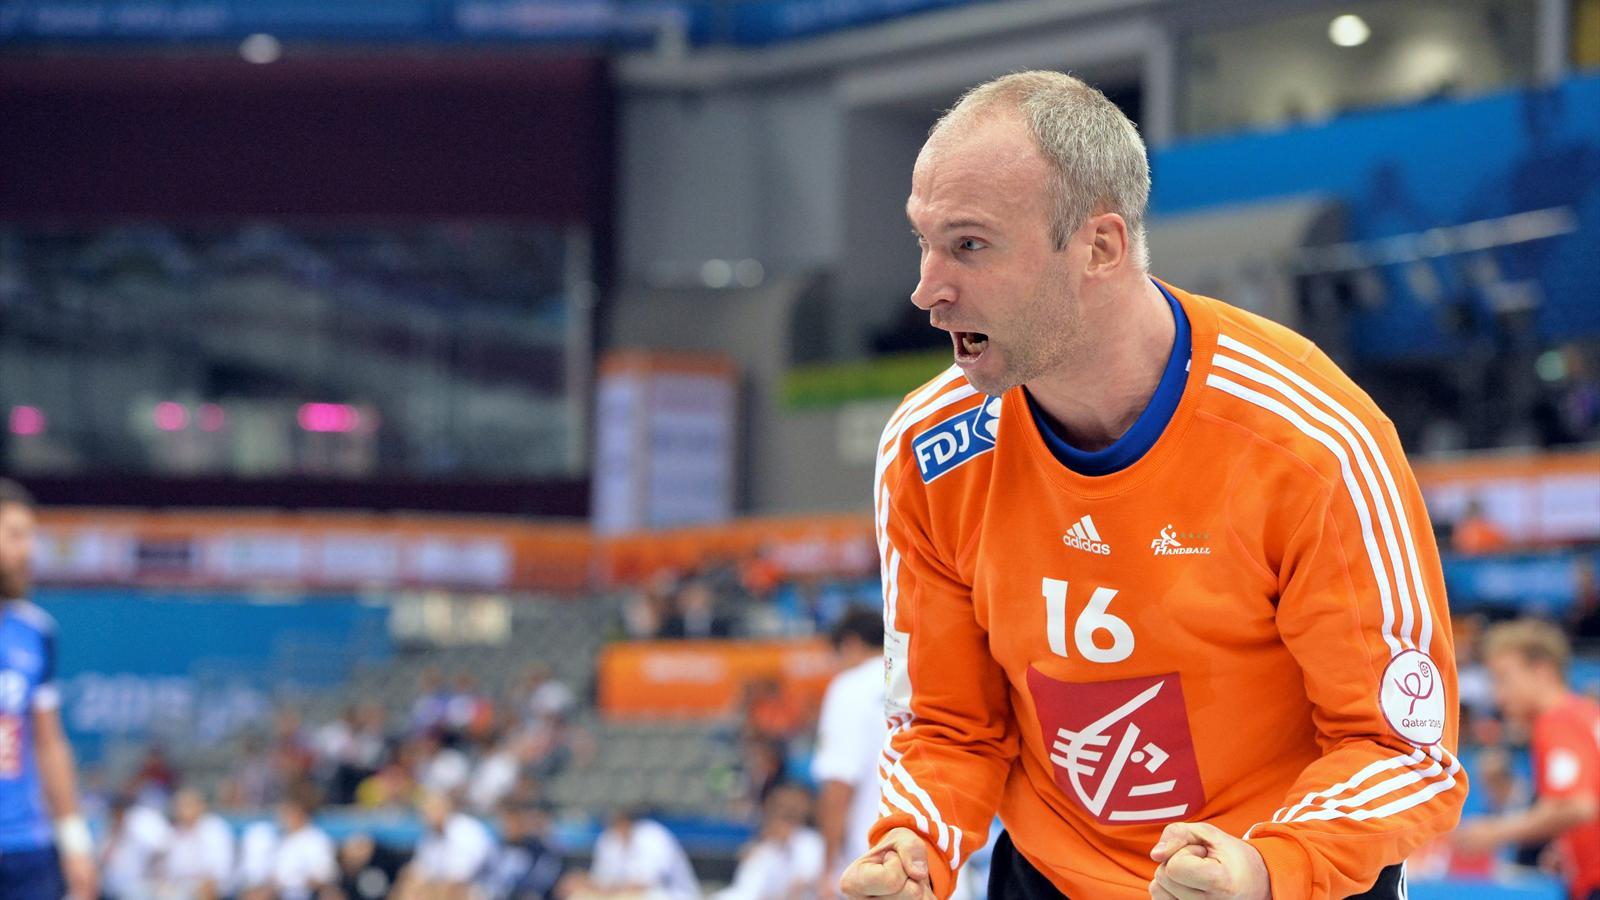 Mondial thierry omeyer l 39 espagne c 39 est tr s solide championnat du monde 2015 handball - Resultats coupe du monde handball ...